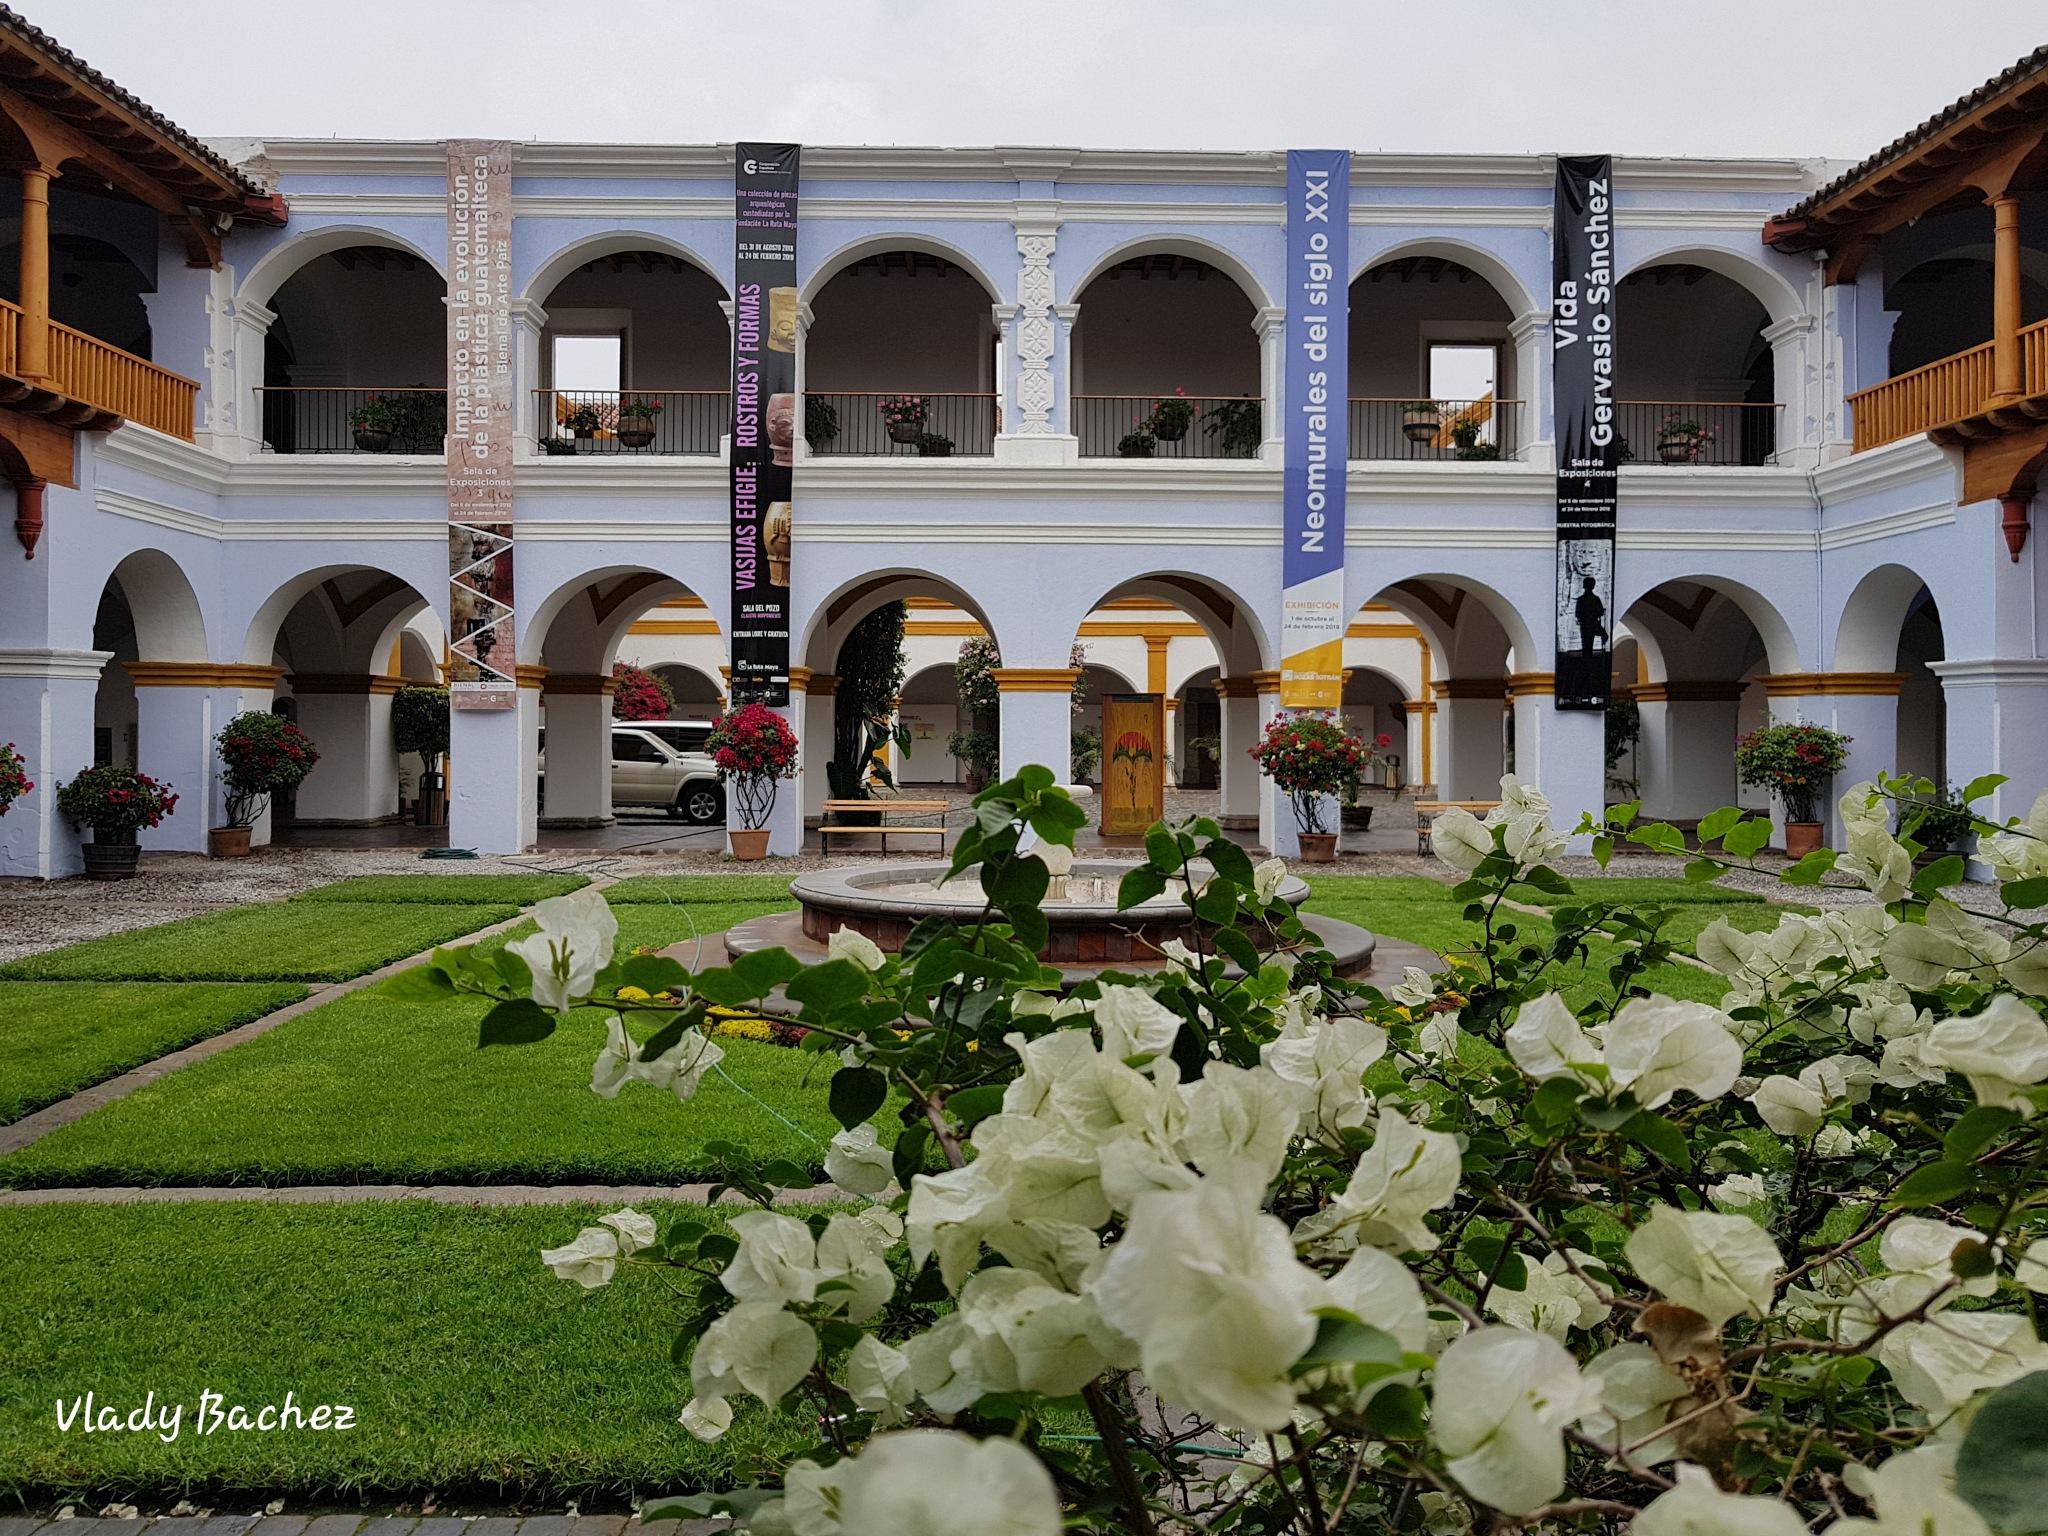 Arcos by vladybachez